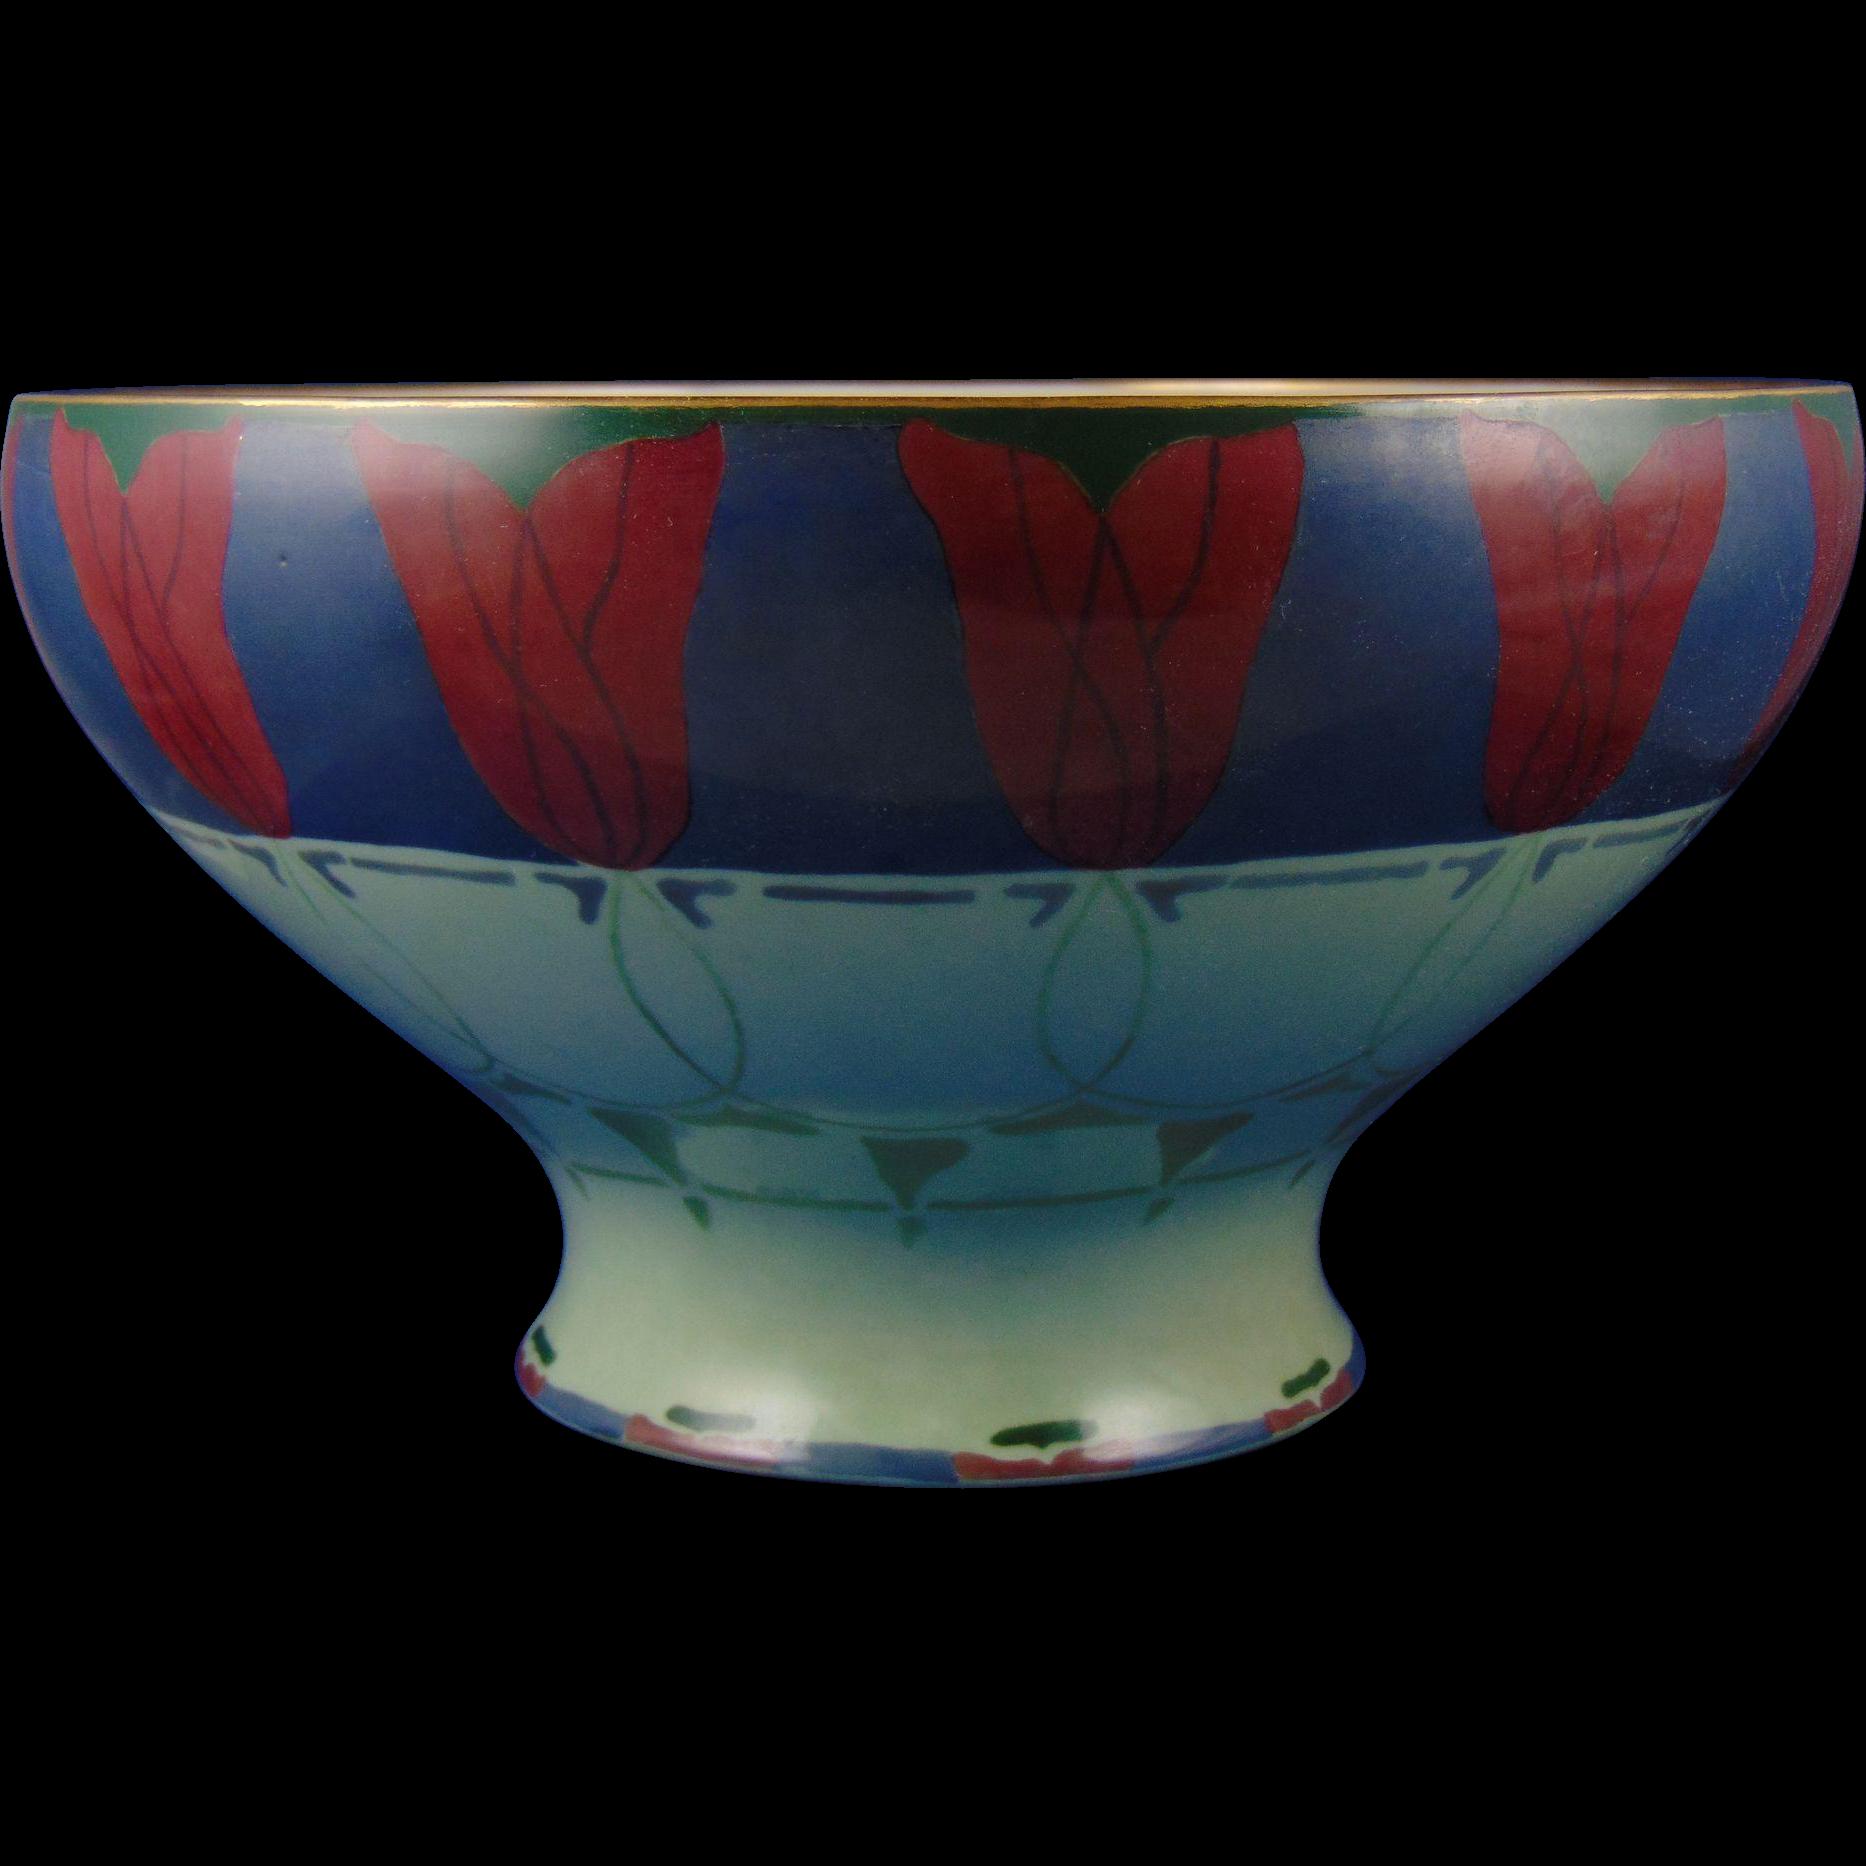 Lenox Belleek Art Deco Tulip Motif Centerpiece Bowl (Signed/c.1906-1924)